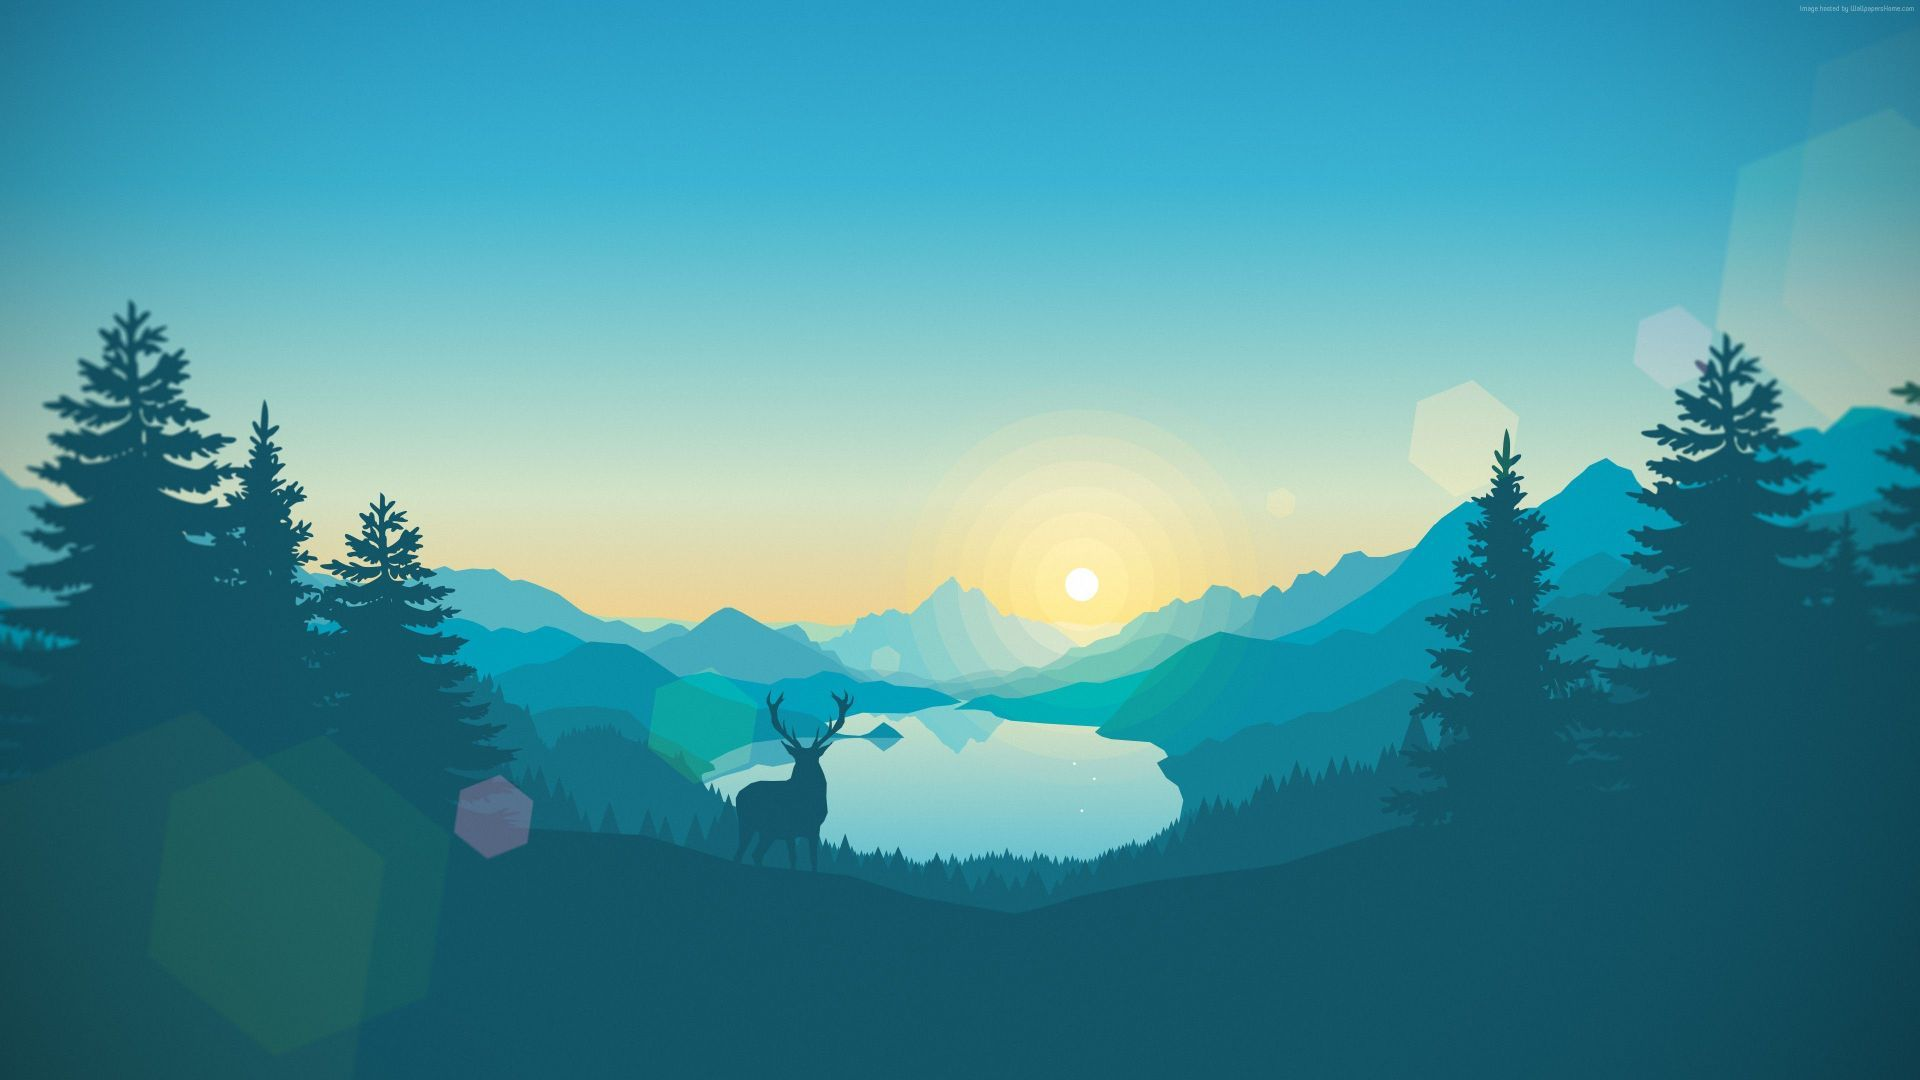 Flat Forest Deer 4k 5k Iphone Wallpaper Abstract Horizontal Landscape Wallpaper Wallpaper Pictures Nature Wallpaper